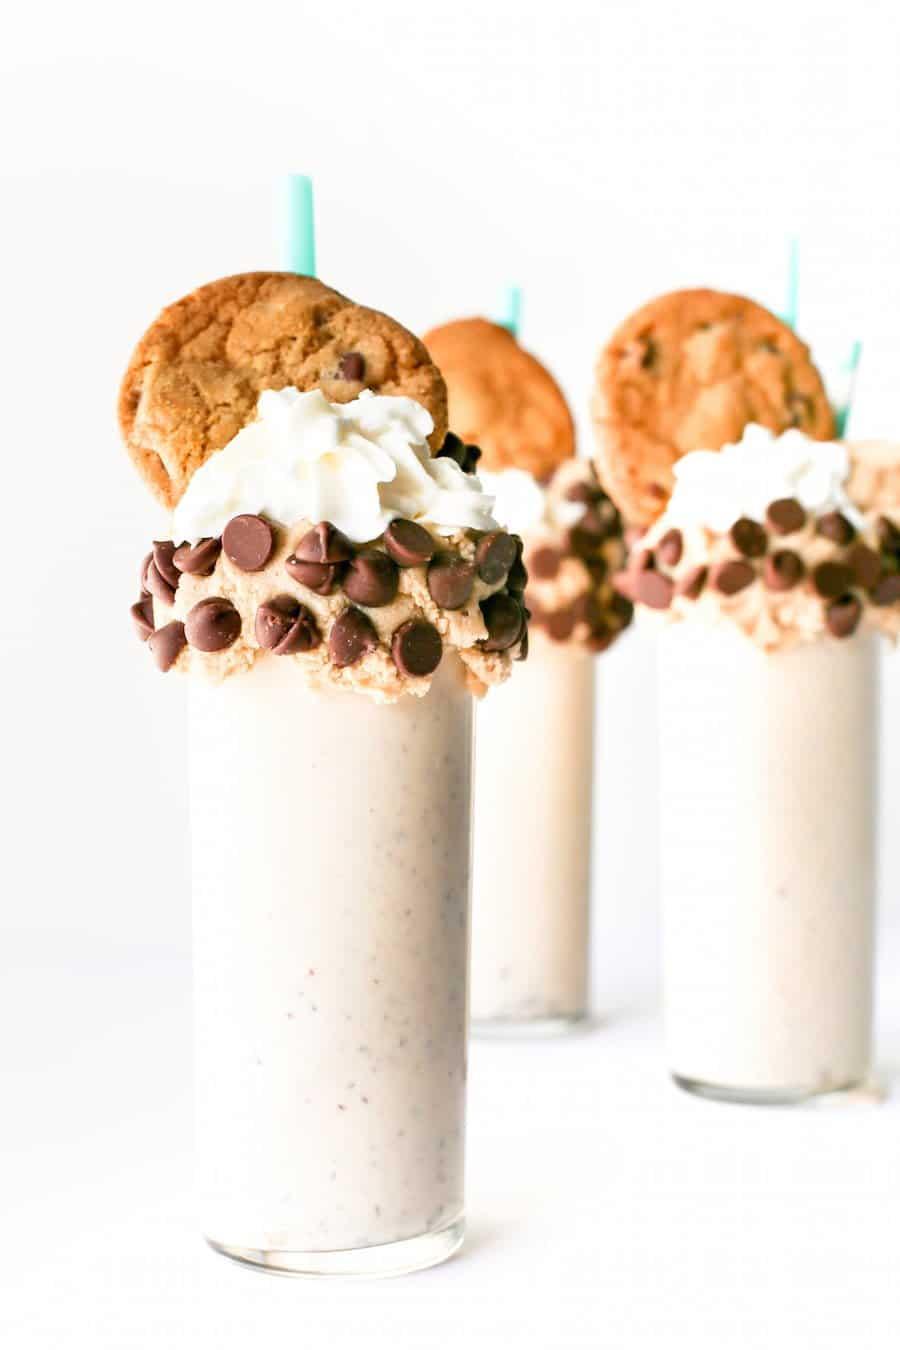 Chocolate Chip Cookie Dough Milkshake, Edible Cookie Dough, Raw Cookie Dough Milkshake, Cookie Dough Vanilla Milkshake, Over the Top Freakshake, Cookie Milkshake, Recipe, Make at Home, Salty Canary